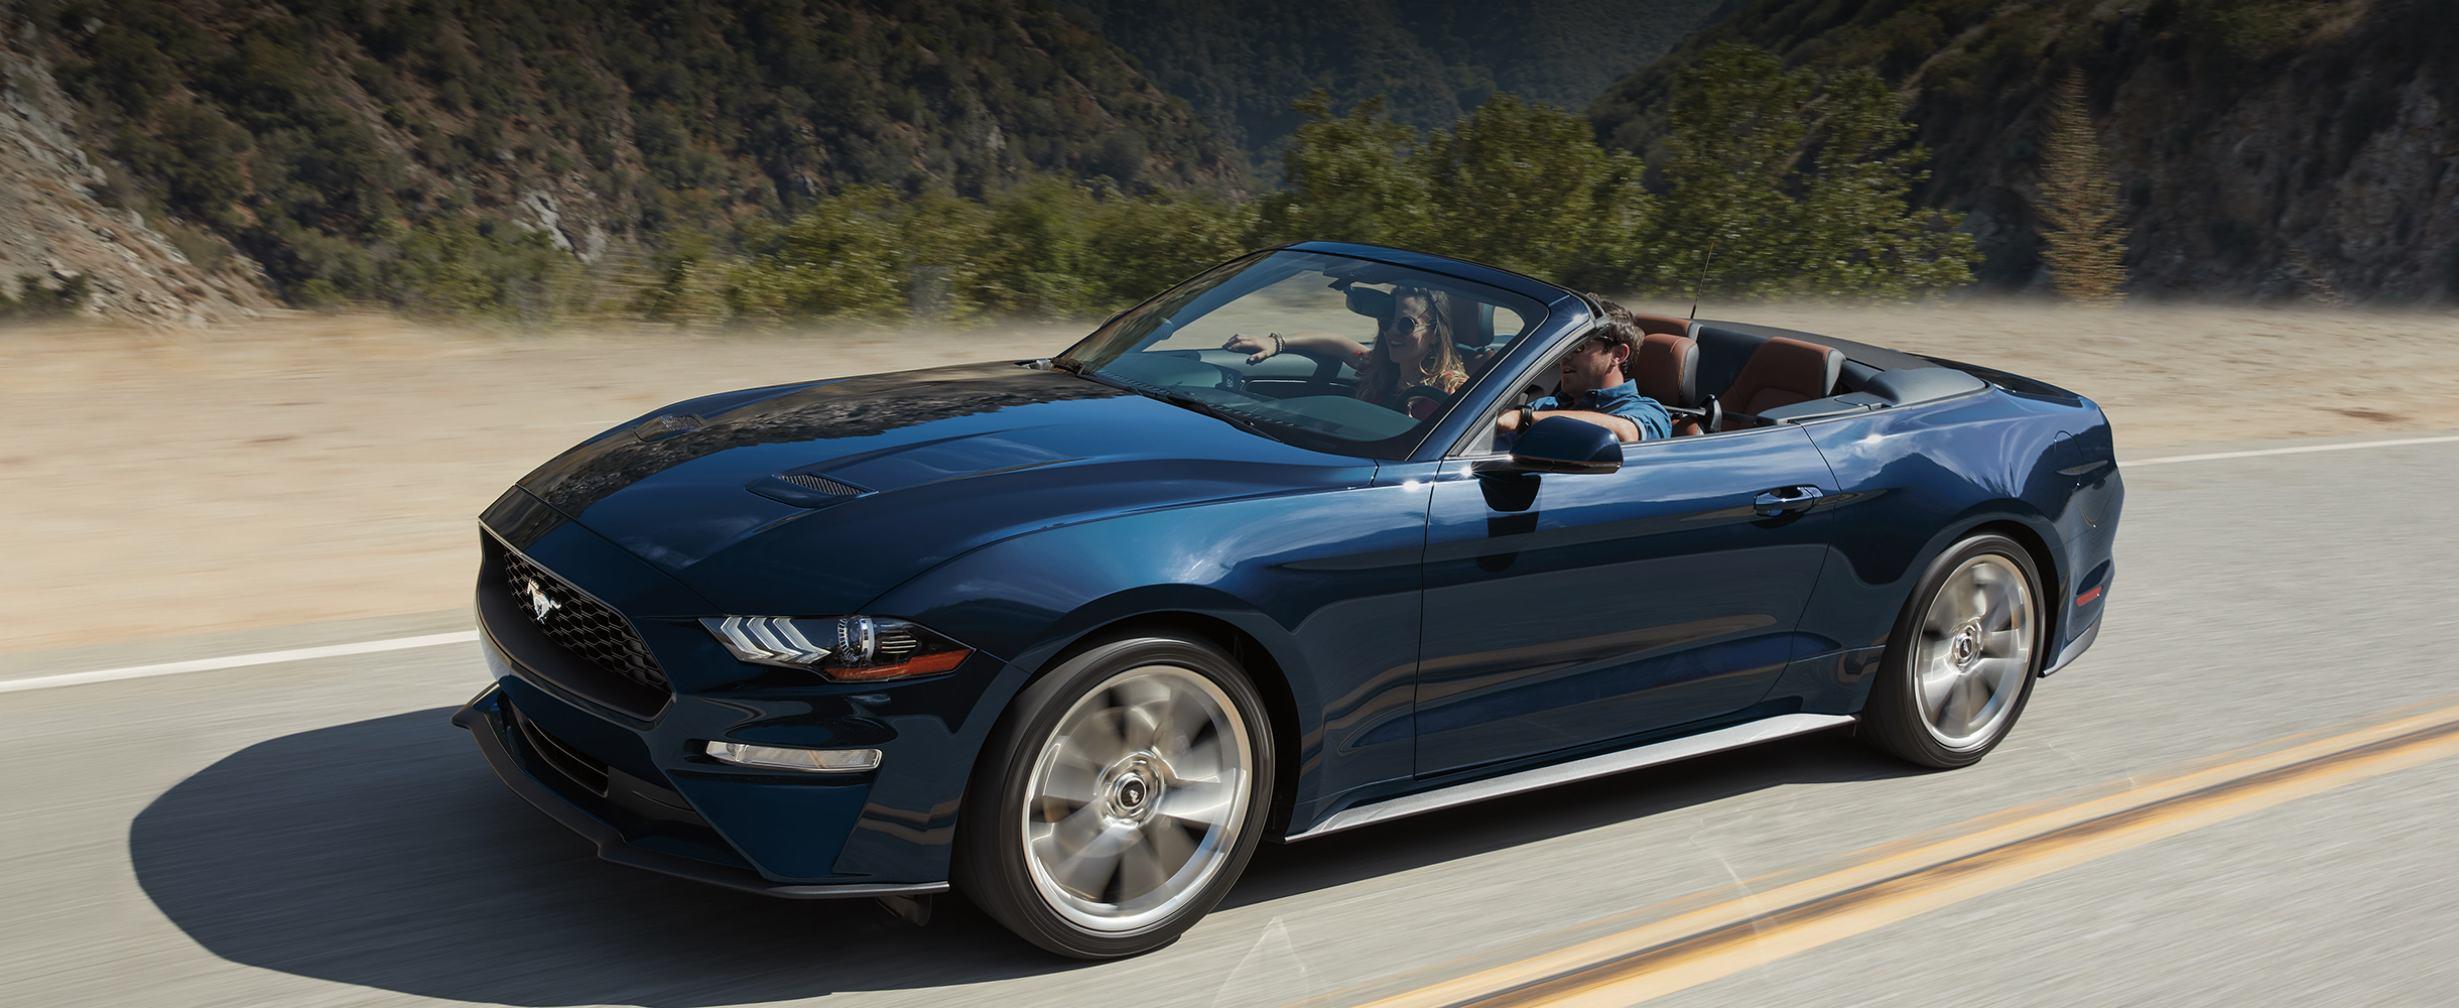 Convertible Rental Cars >> Budget Ford Mustang Convertible Rentals Or Similar